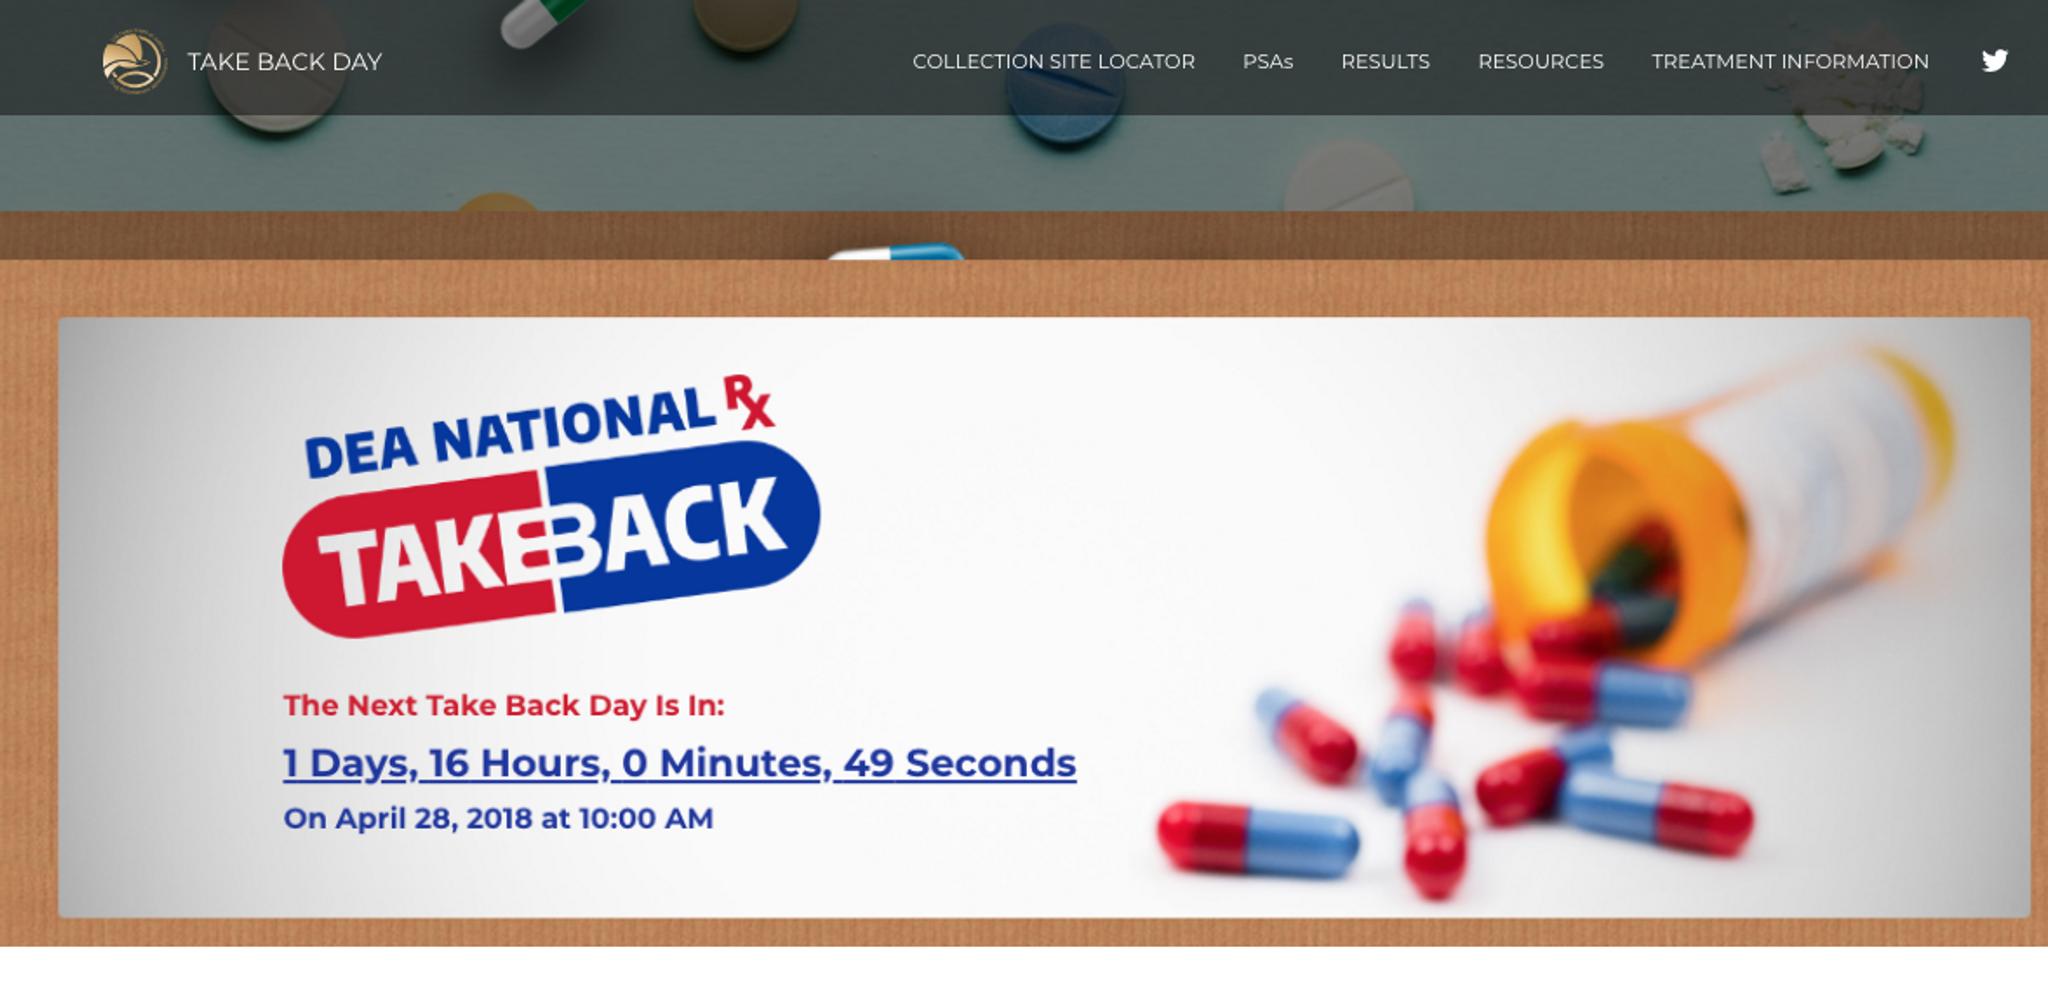 Battle looms over cost of disposing unused prescription drugs - Washington Times